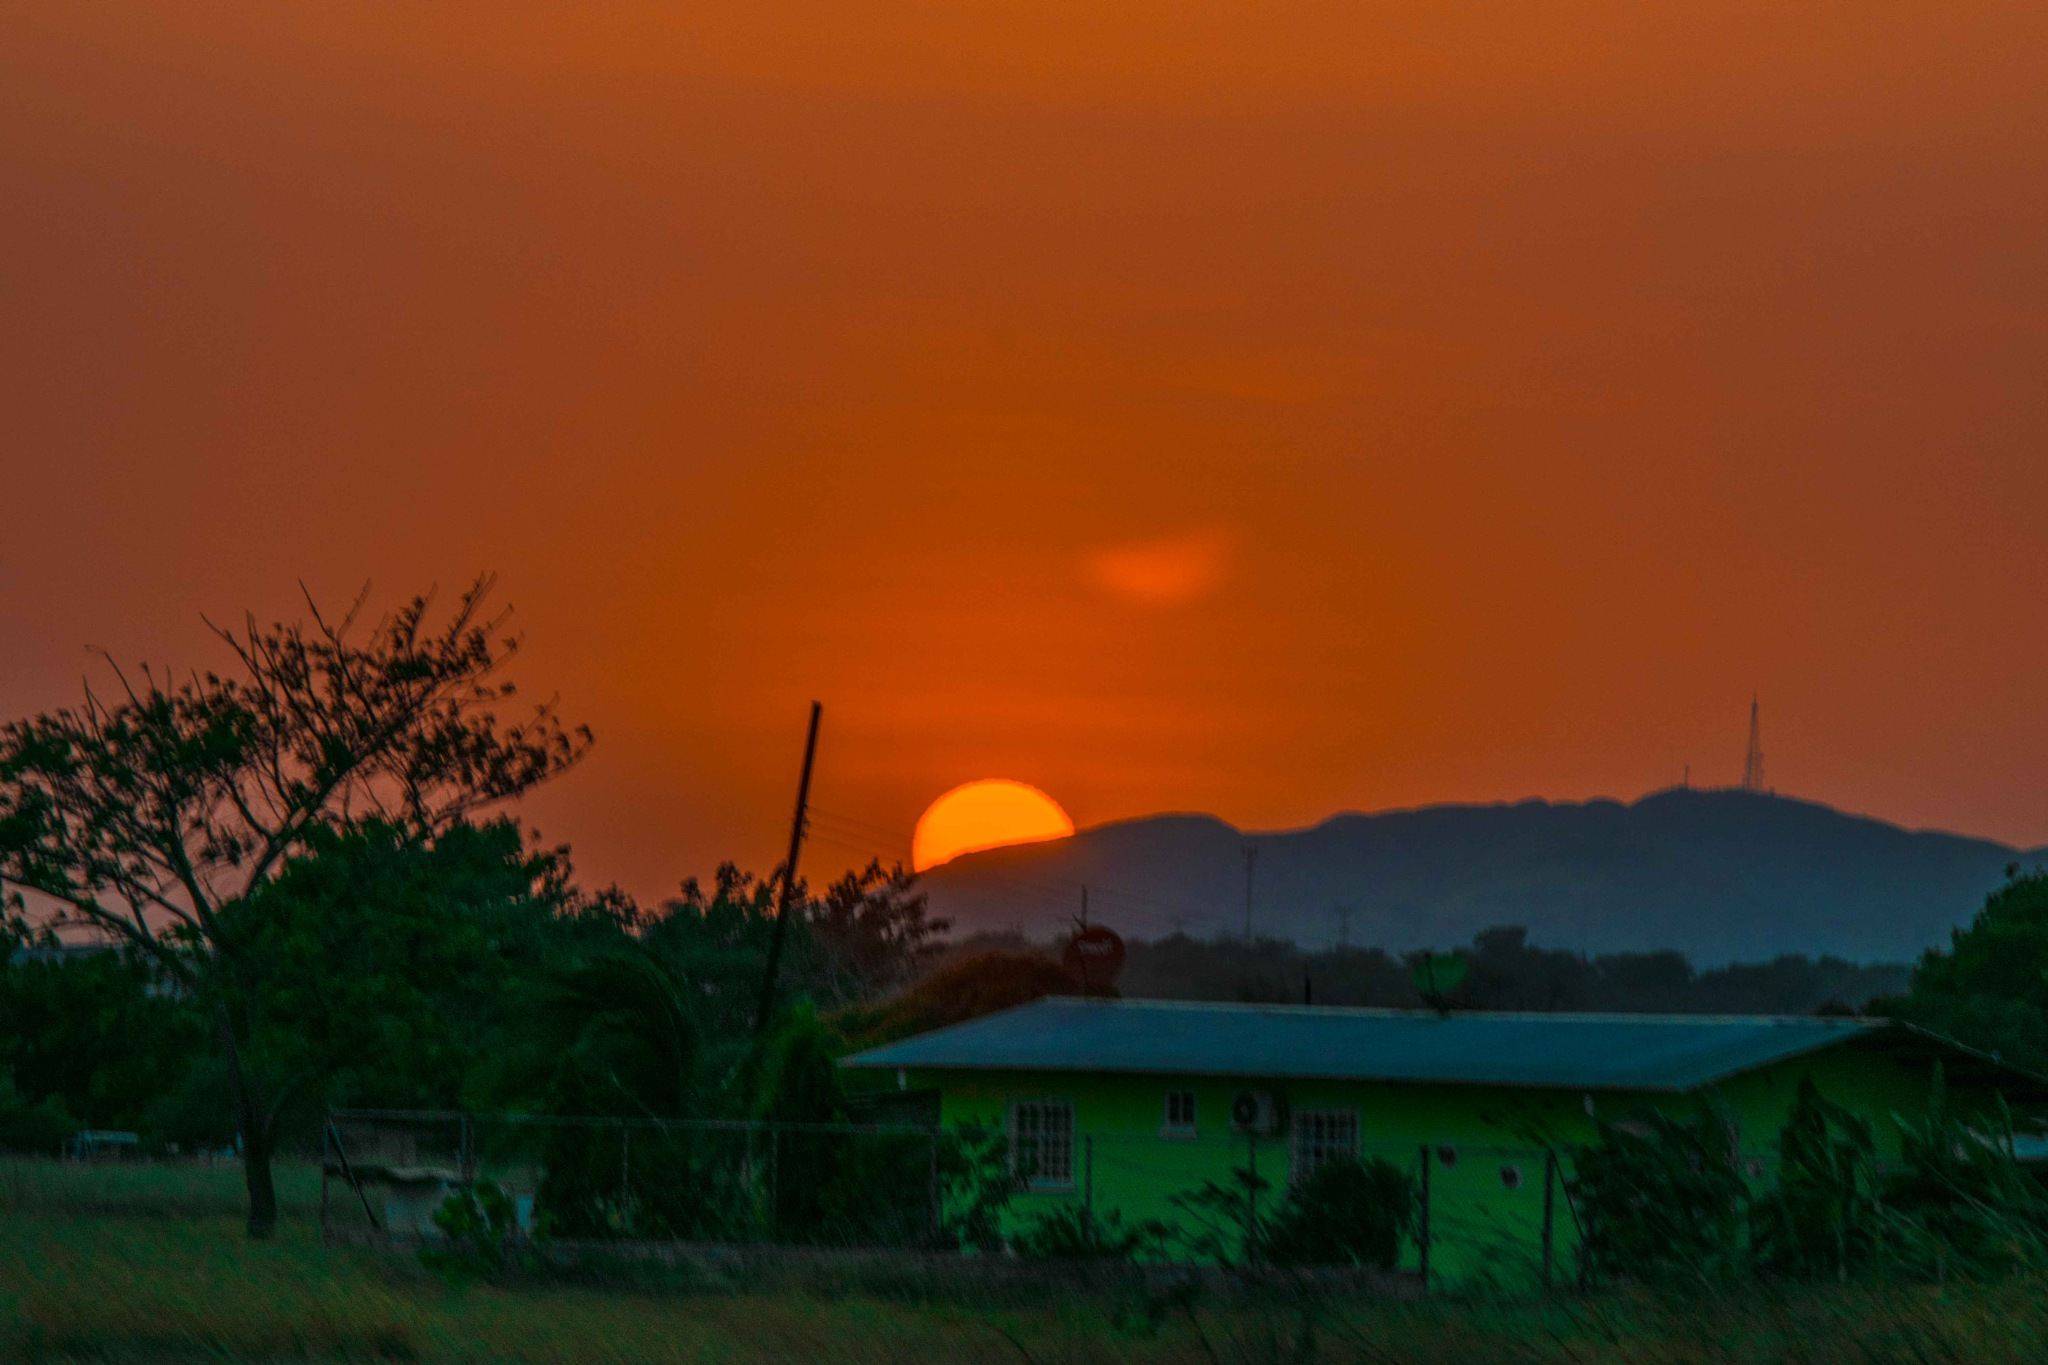 Sunset by Manuel Calderón Quintana.